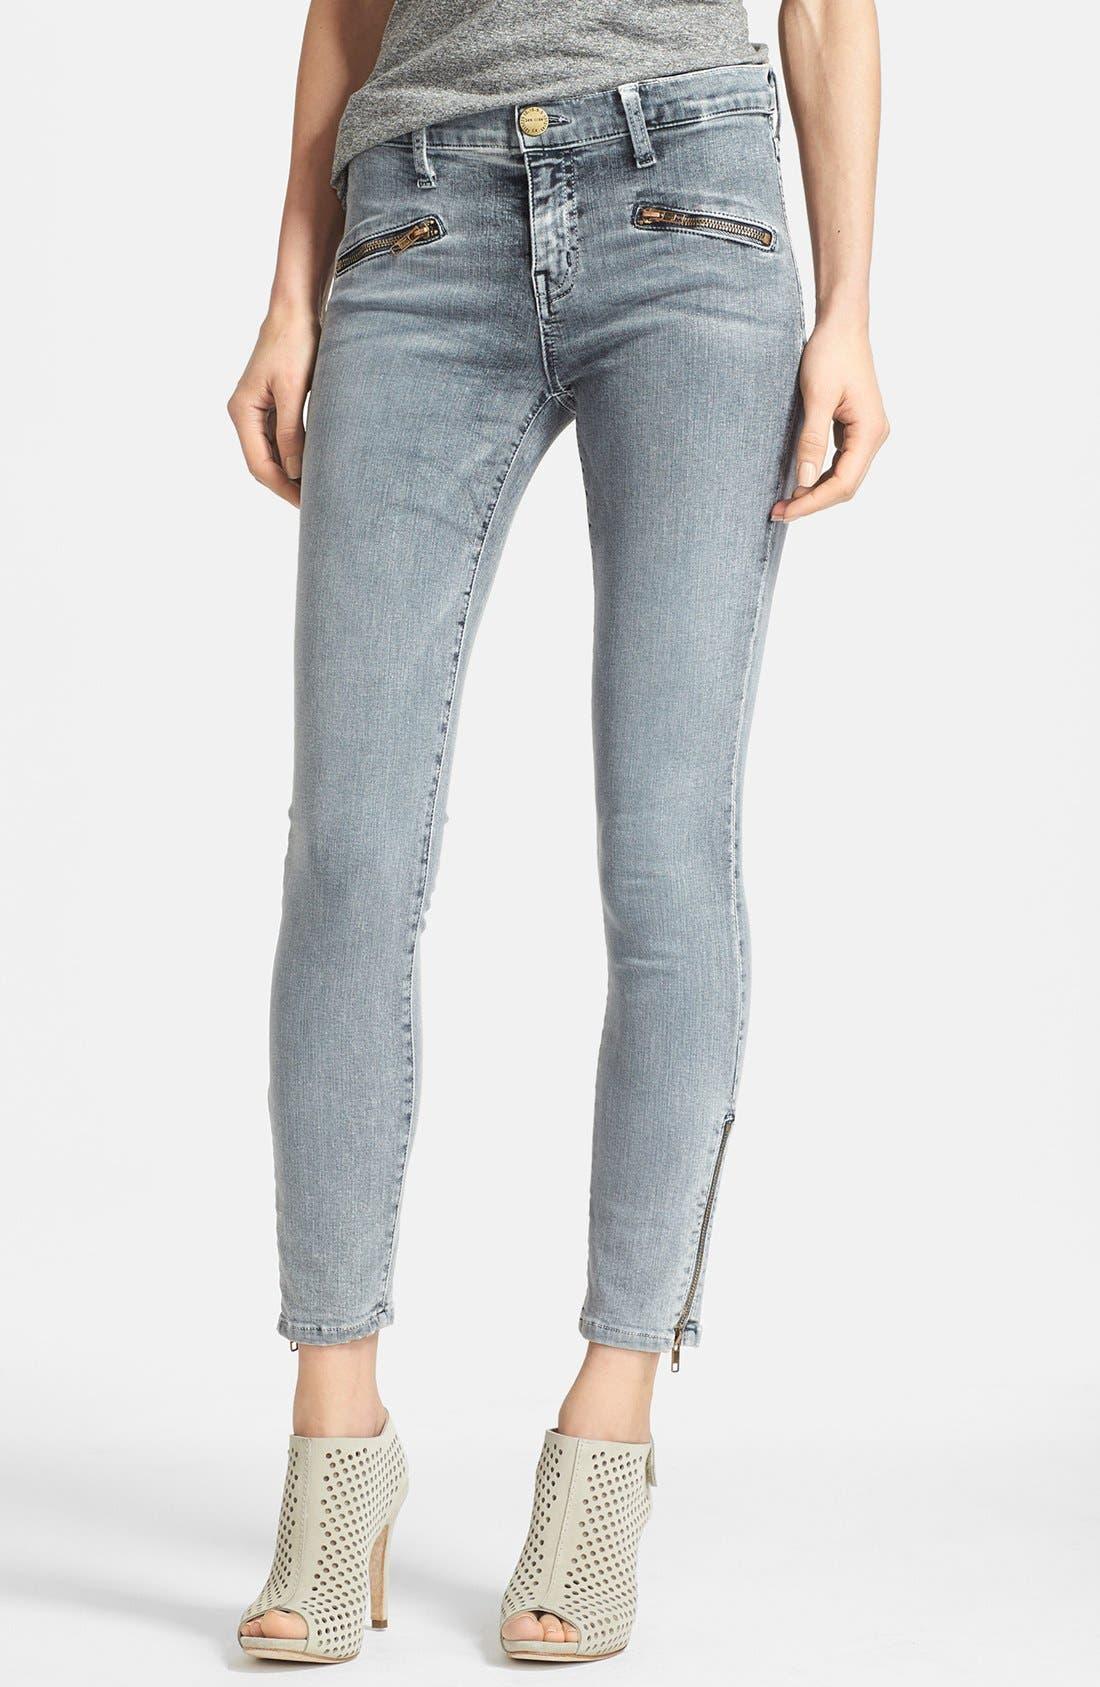 Main Image - Current/Elliott 'The Soho' Zip Stiletto Skinny Jeans (Bleach Out Navy)